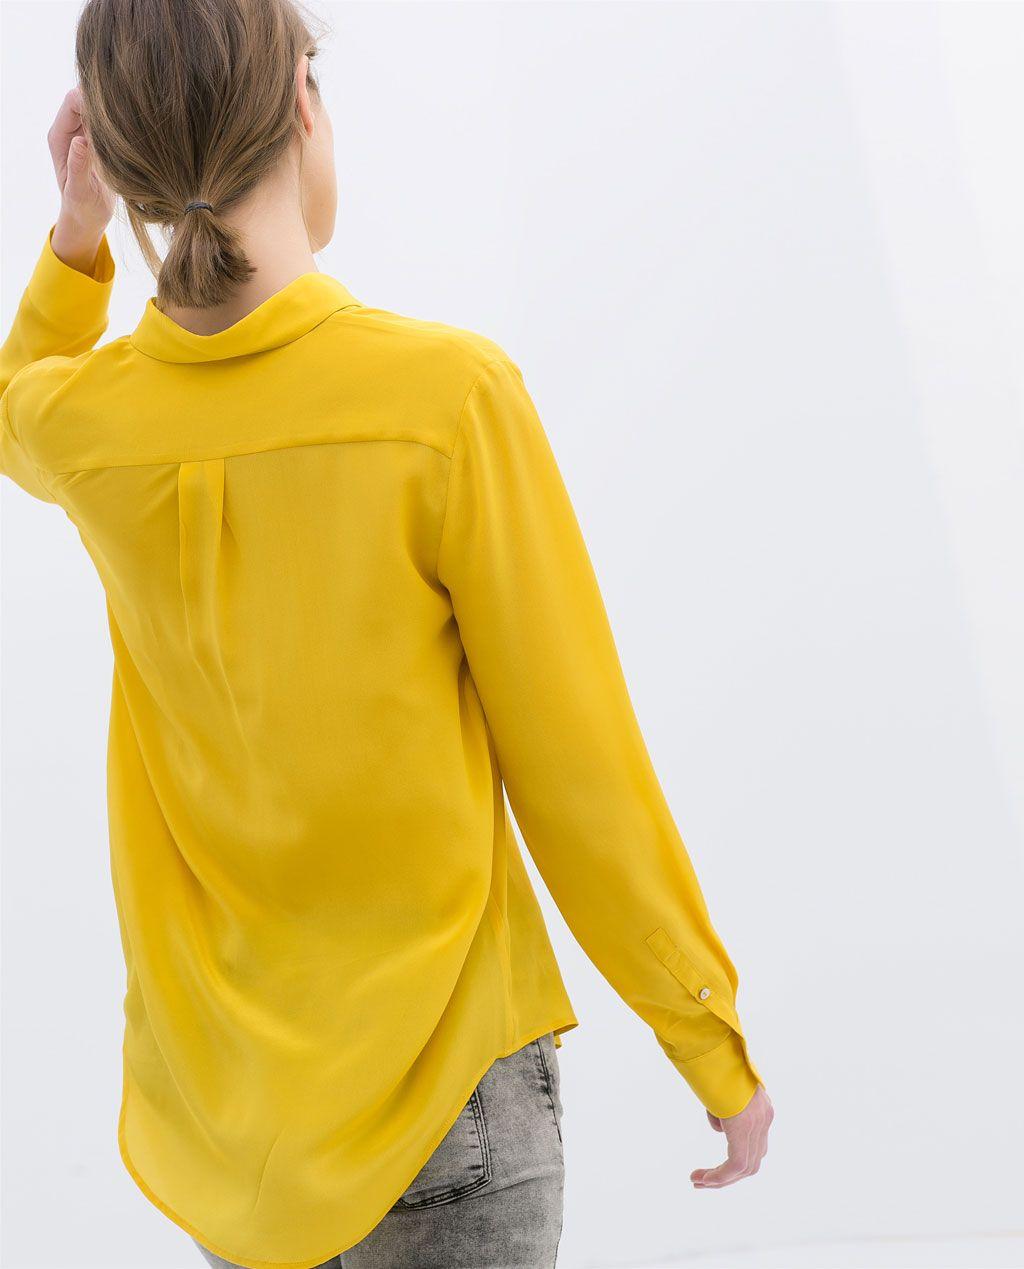 d0494d07cf12e sunny blouse from Zara. sunny blouse from Zara Yellow Shirts